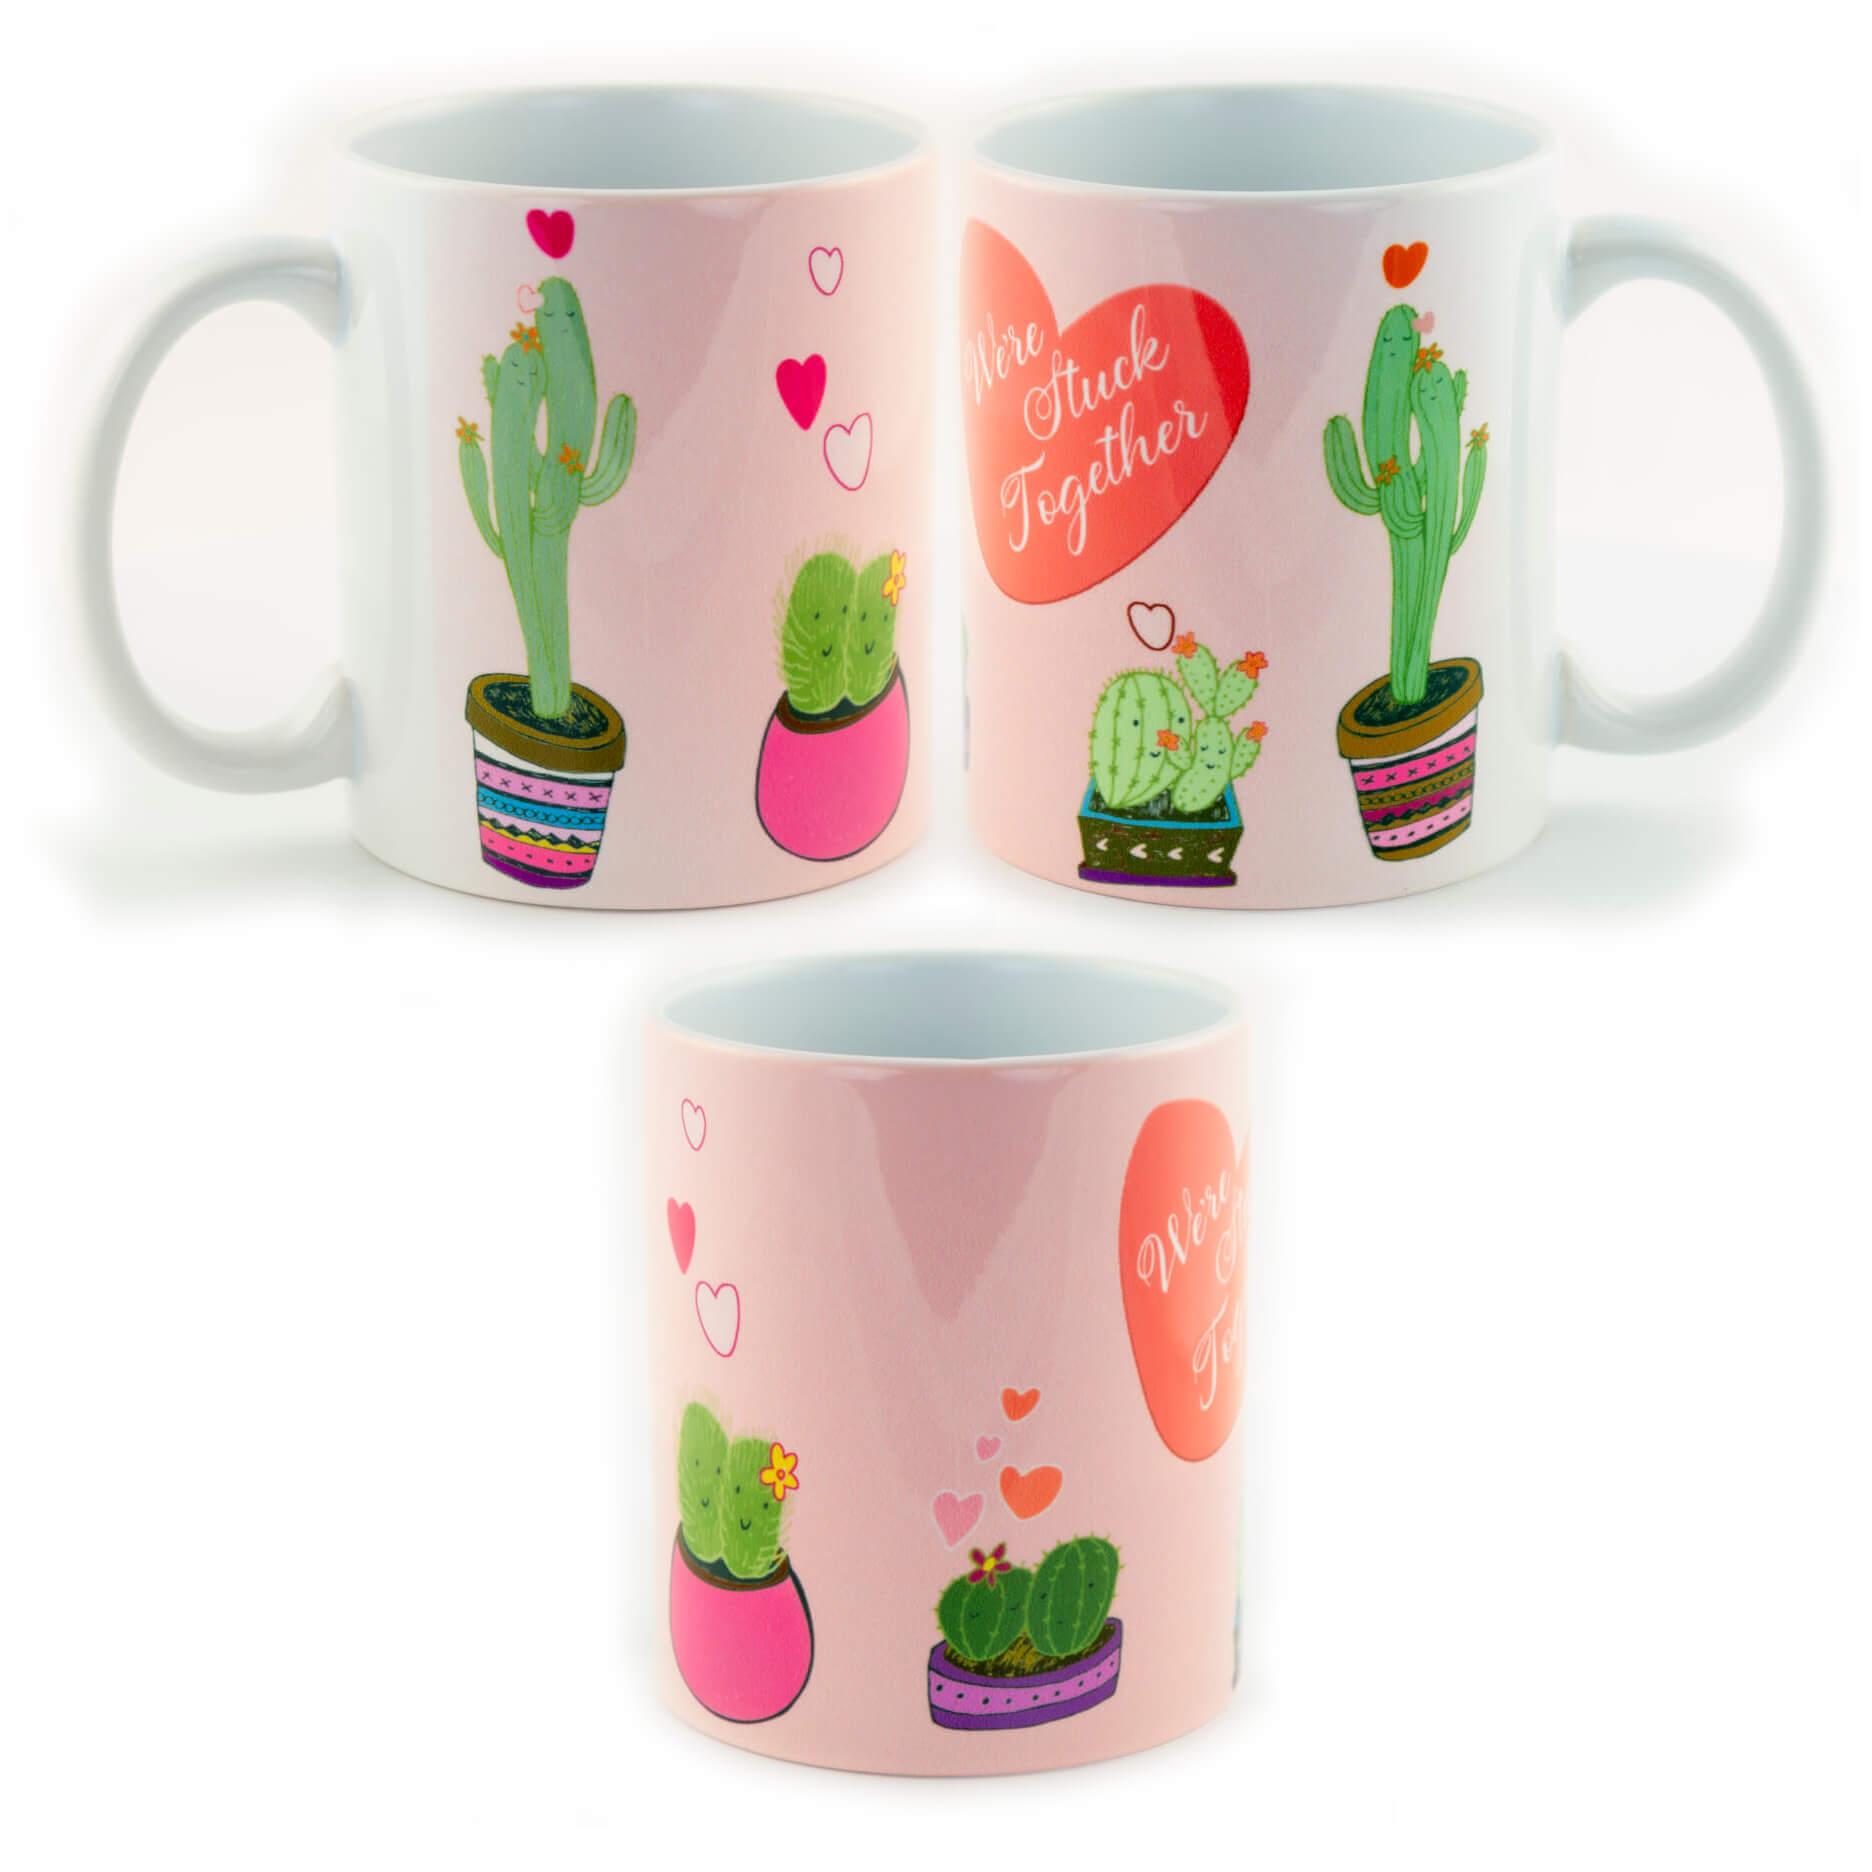 We're Stuck Together Valentine's Cactus Mug